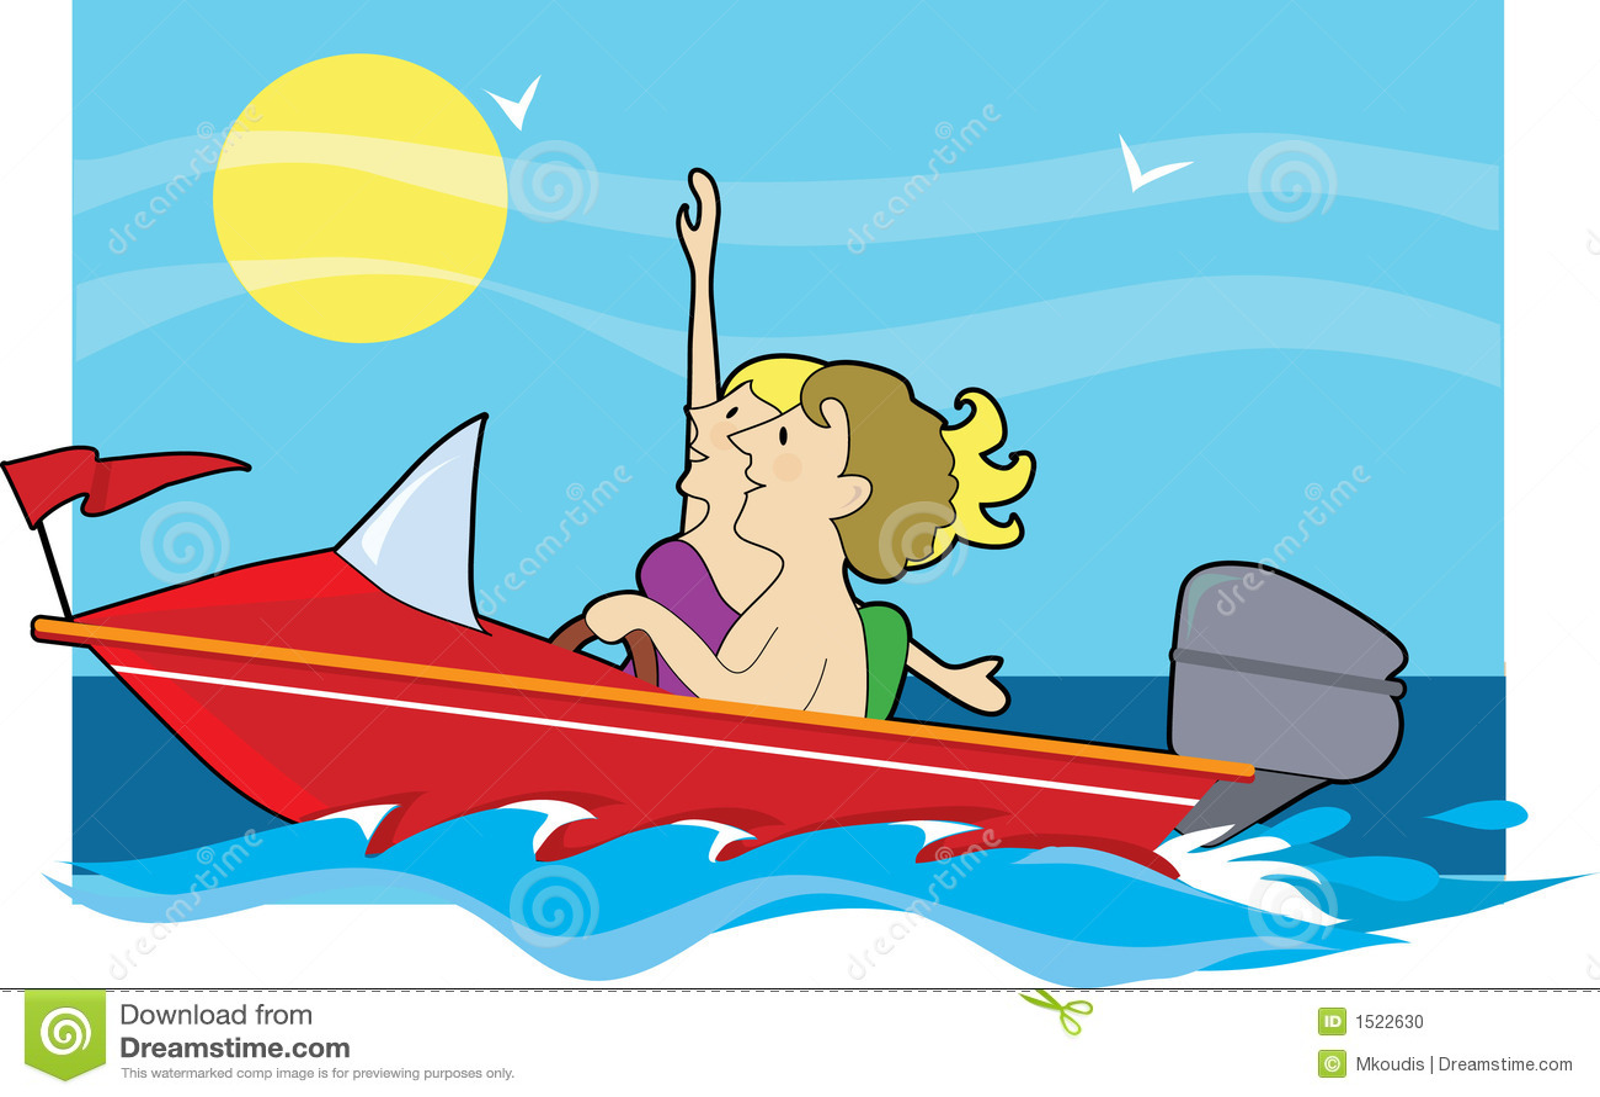 boat ride clipart - photo #4